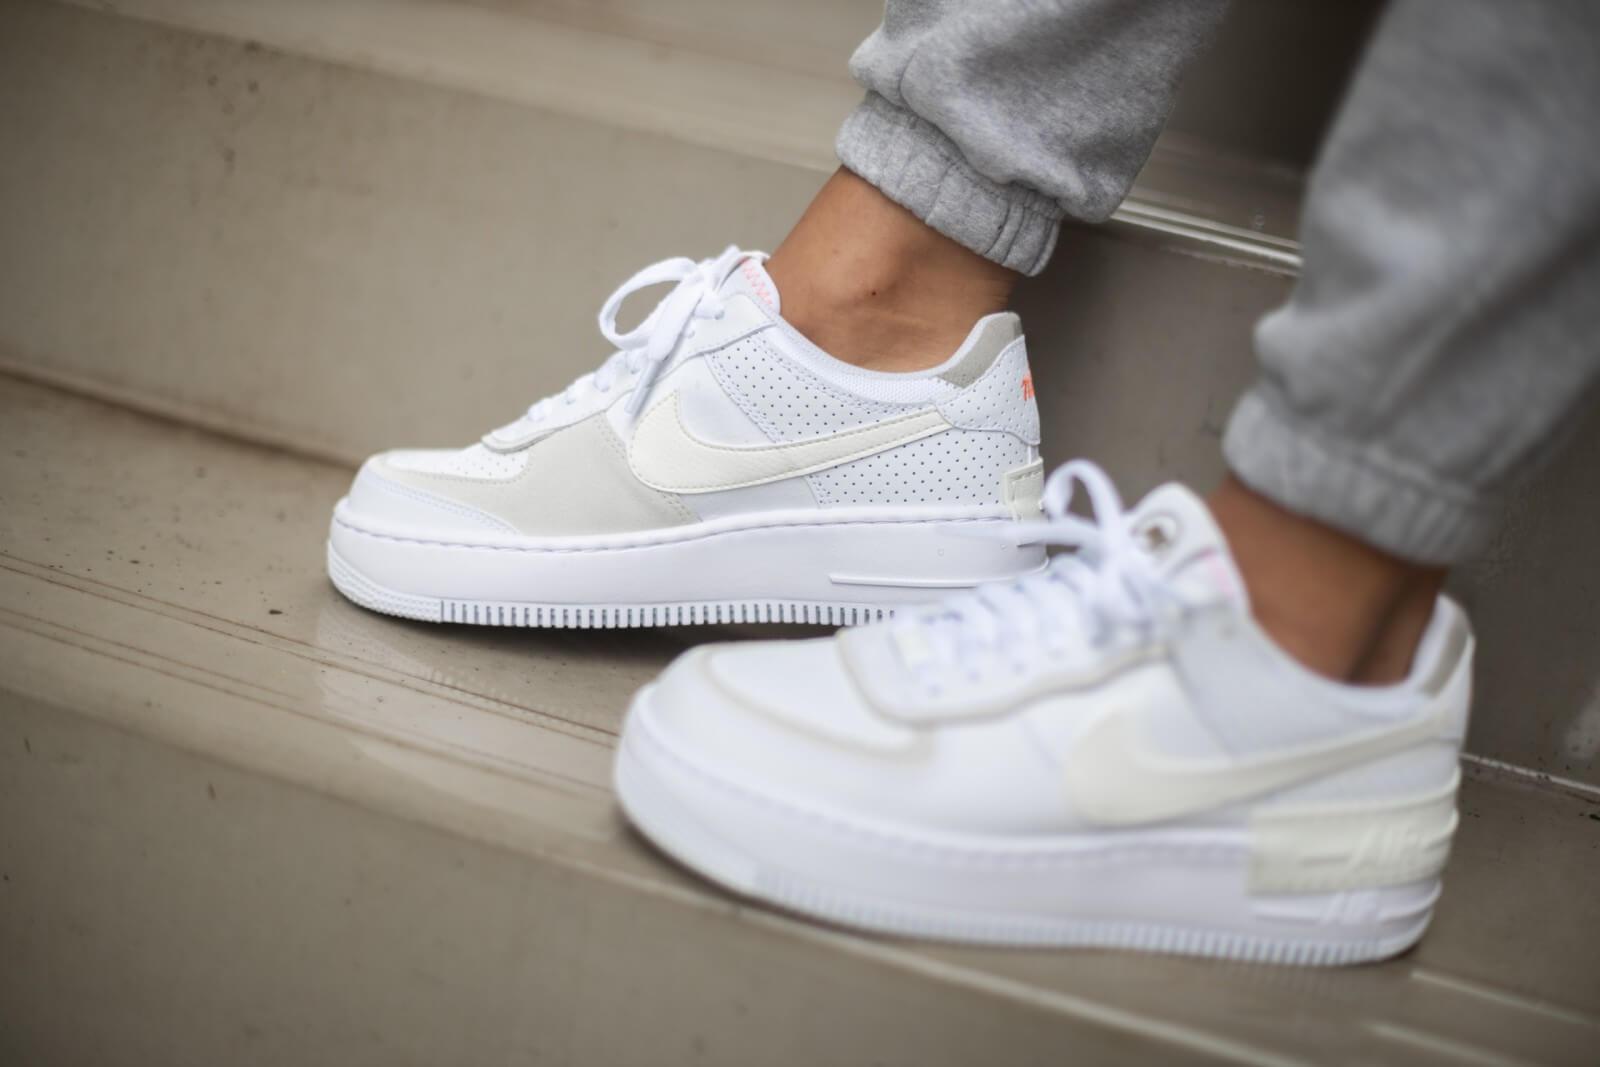 Nike Women S Air Force 1 Shadow White Sail Stone Cz8107 100